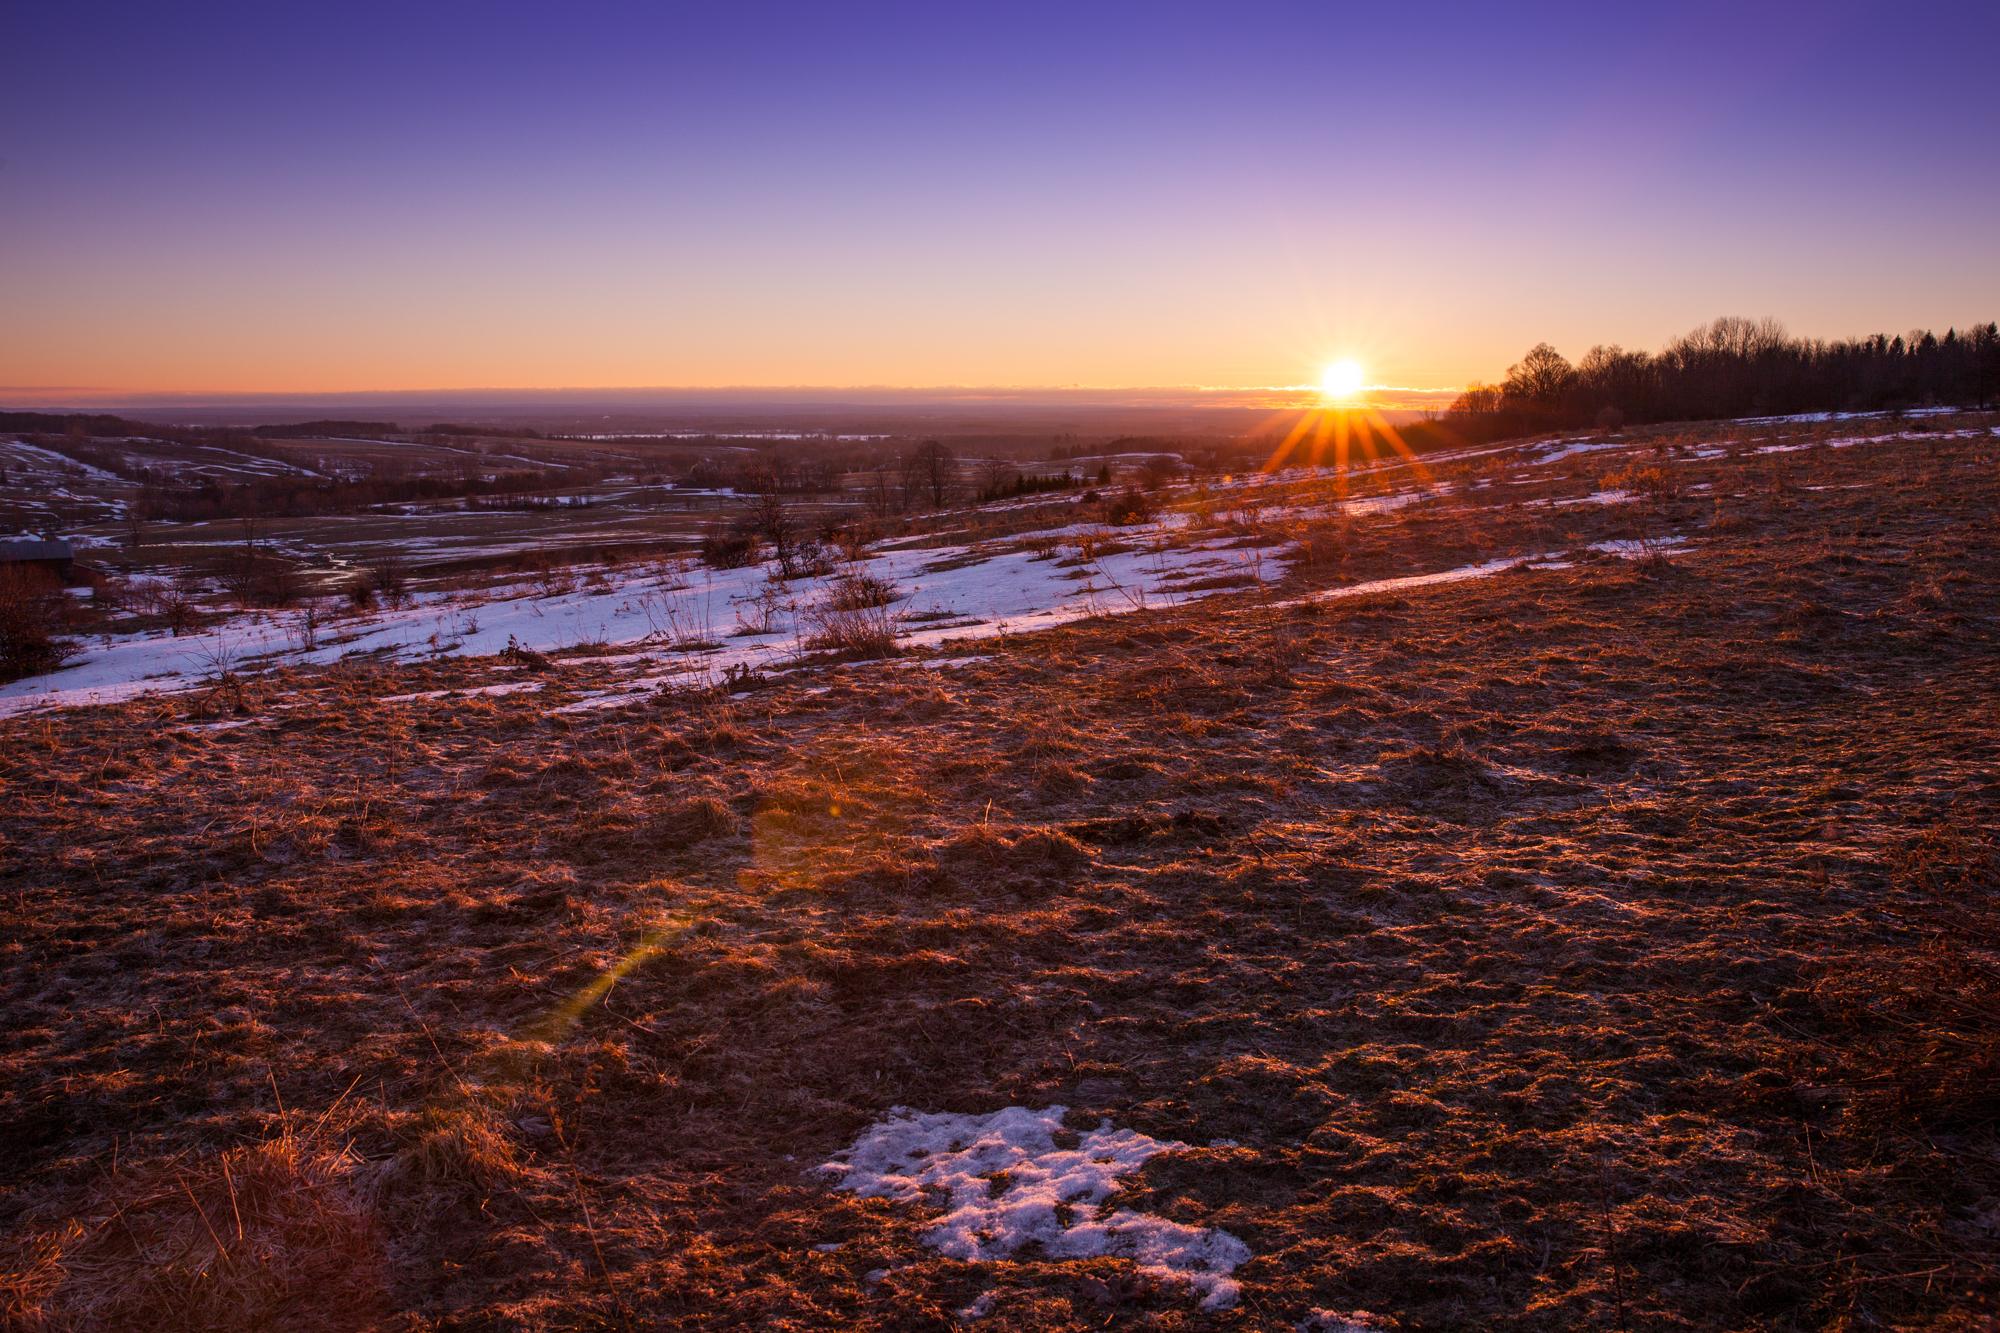 Sunrise in February